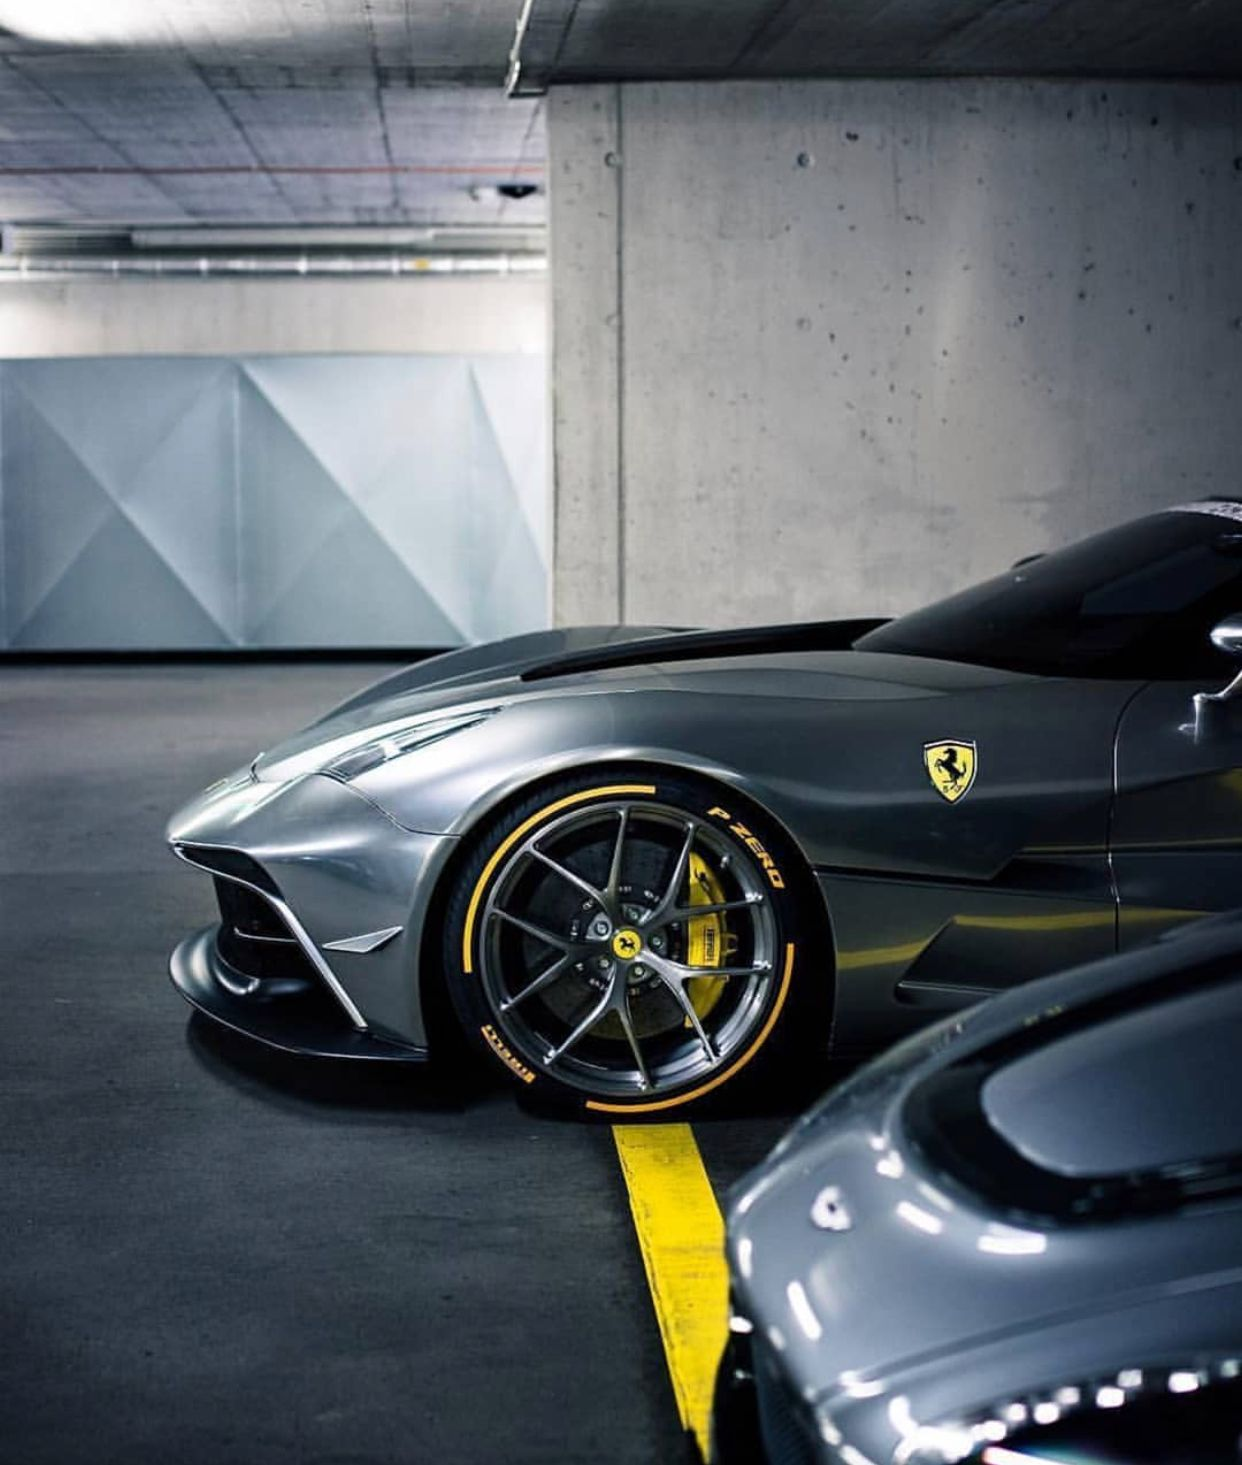 Ferrari 812 Superfast Super Cars Fast Sports Cars Luxury Cars